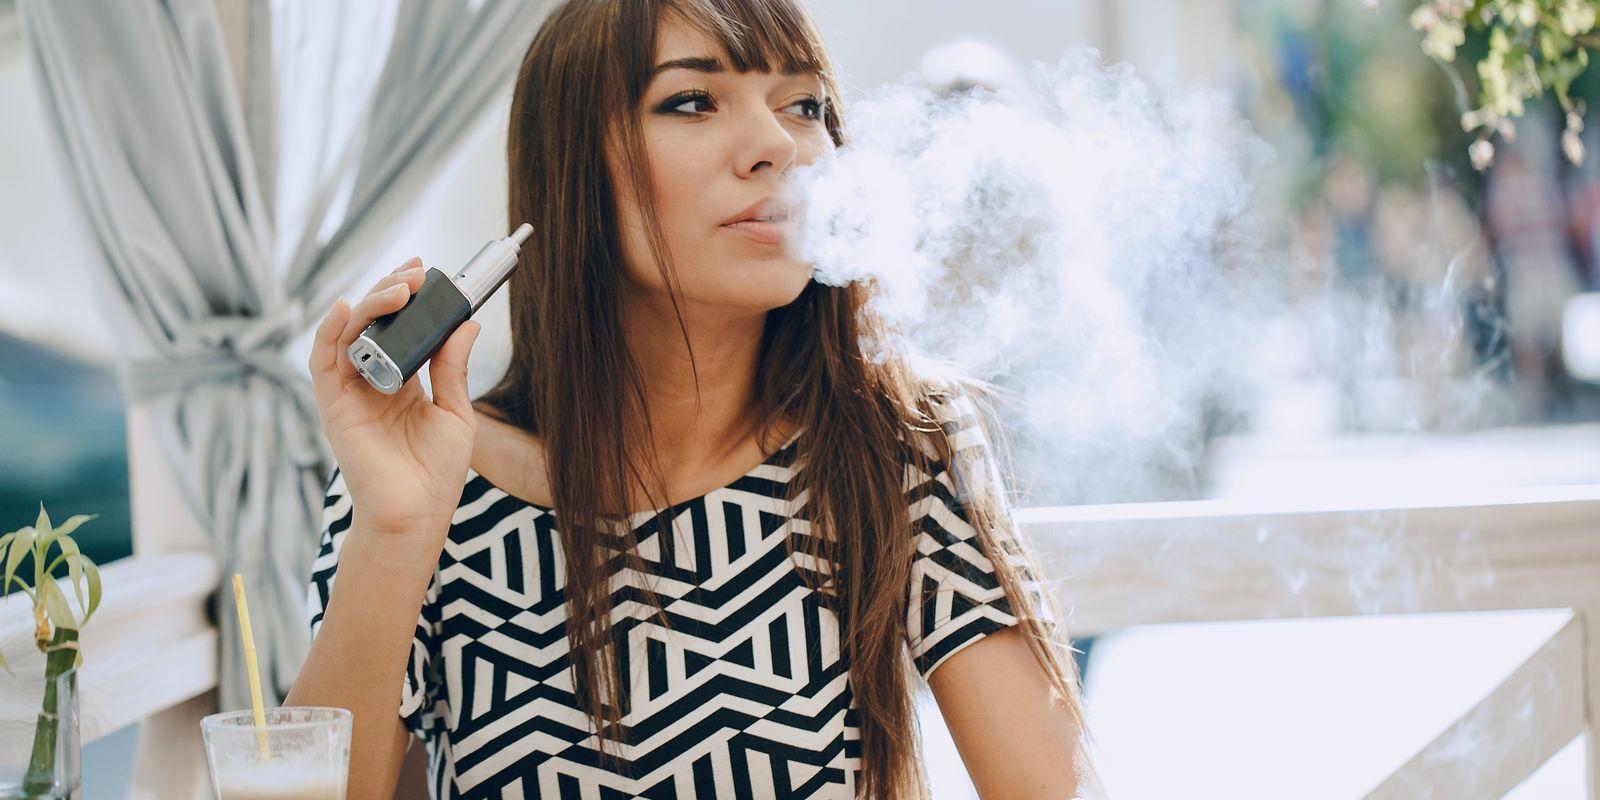 Pravda o elektronických cigaretách